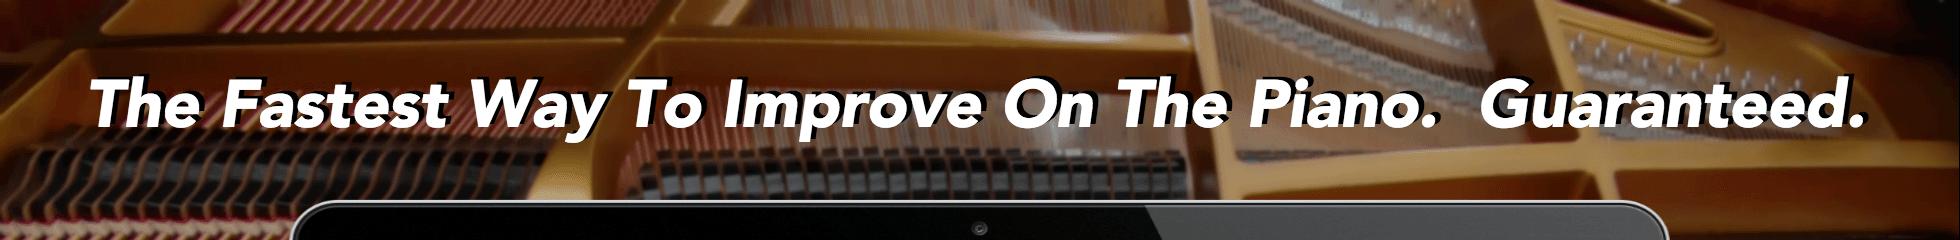 www onlinepianist com